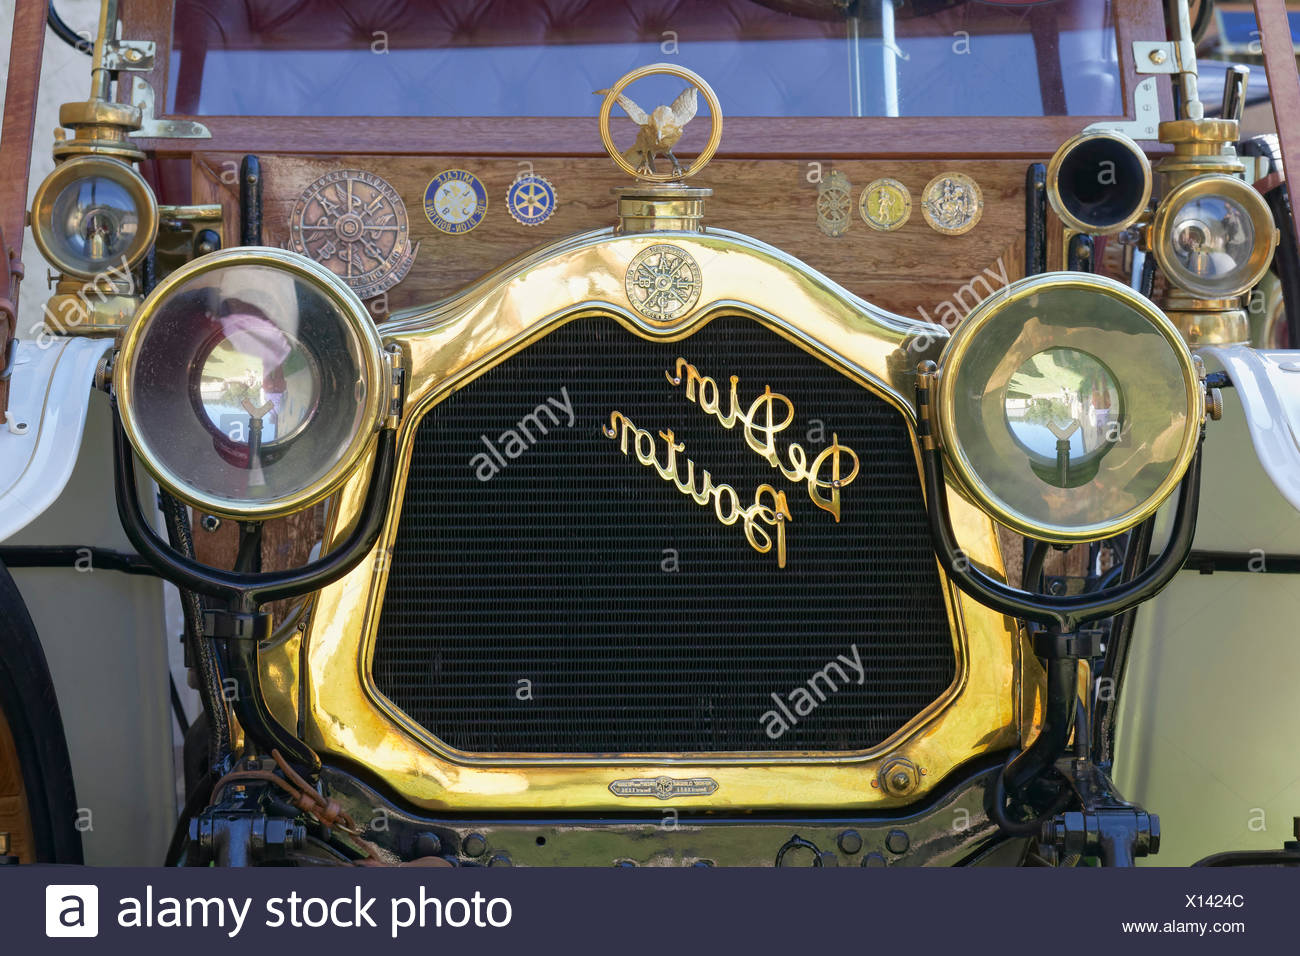 De Dion Bouton emblem on engine of car, Landaulet 1908 model of the French classic car, Schloss Dyck Classic Days 2016 Jüchen - Stock Image